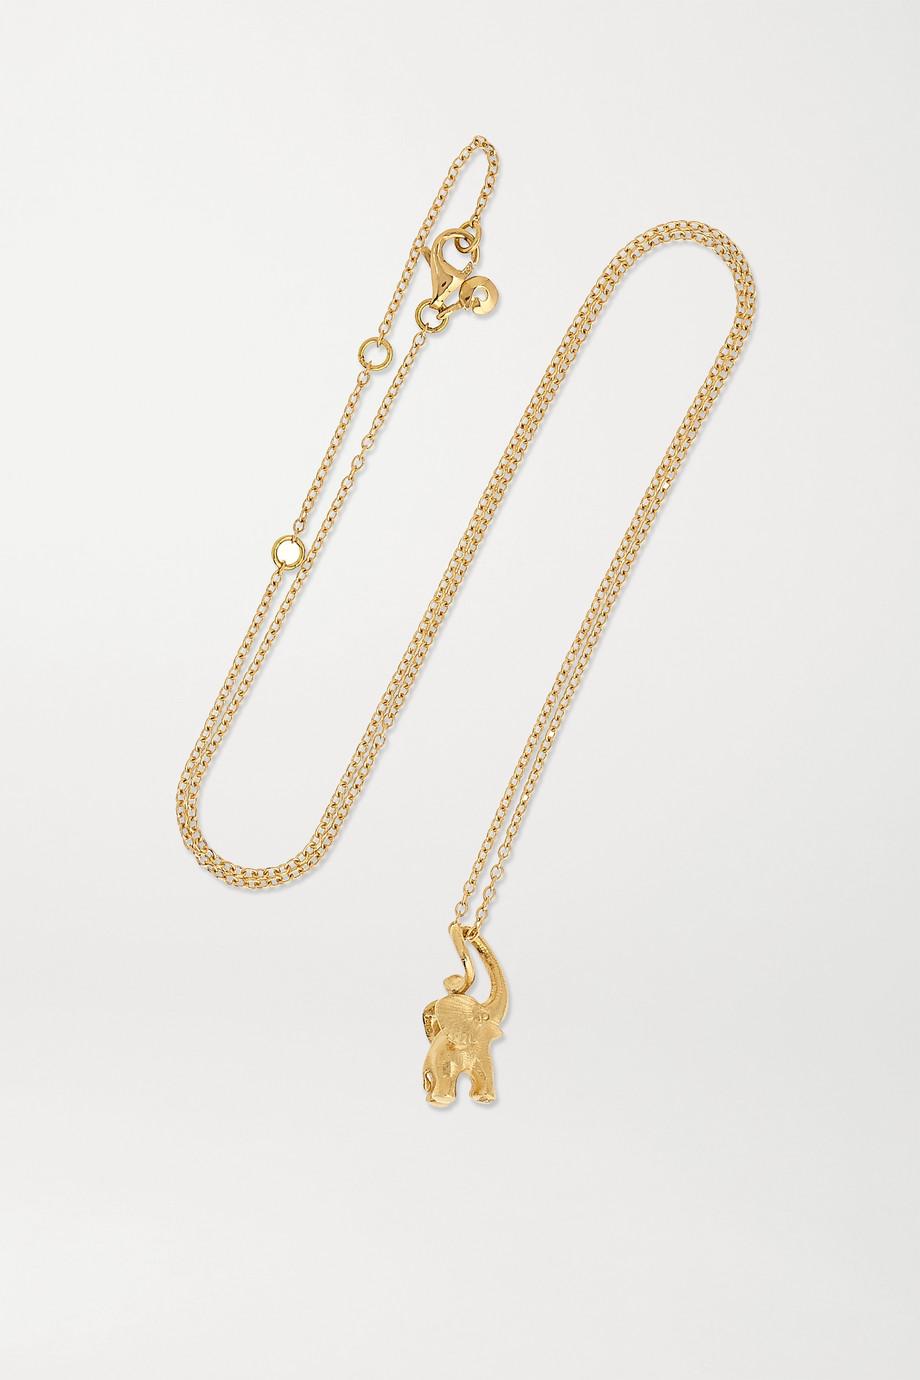 OLE LYNGGAARD COPENHAGEN My Little World 18-karat gold diamond necklace